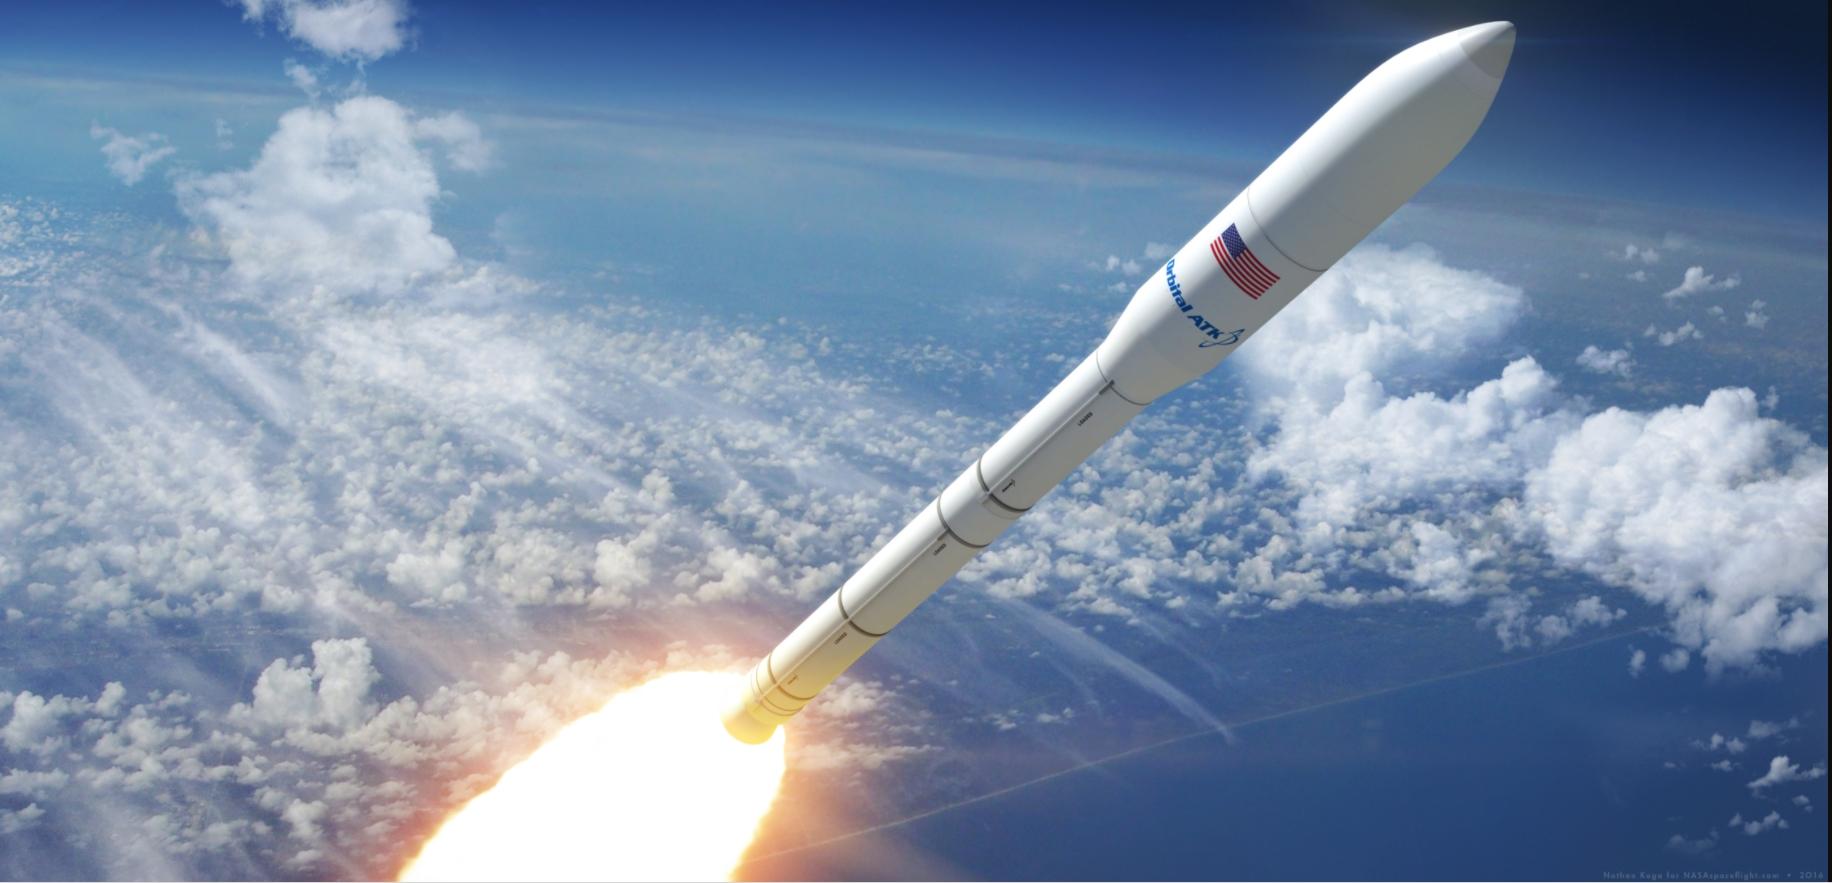 orbital atk preparing for next phase of ngl rocket development